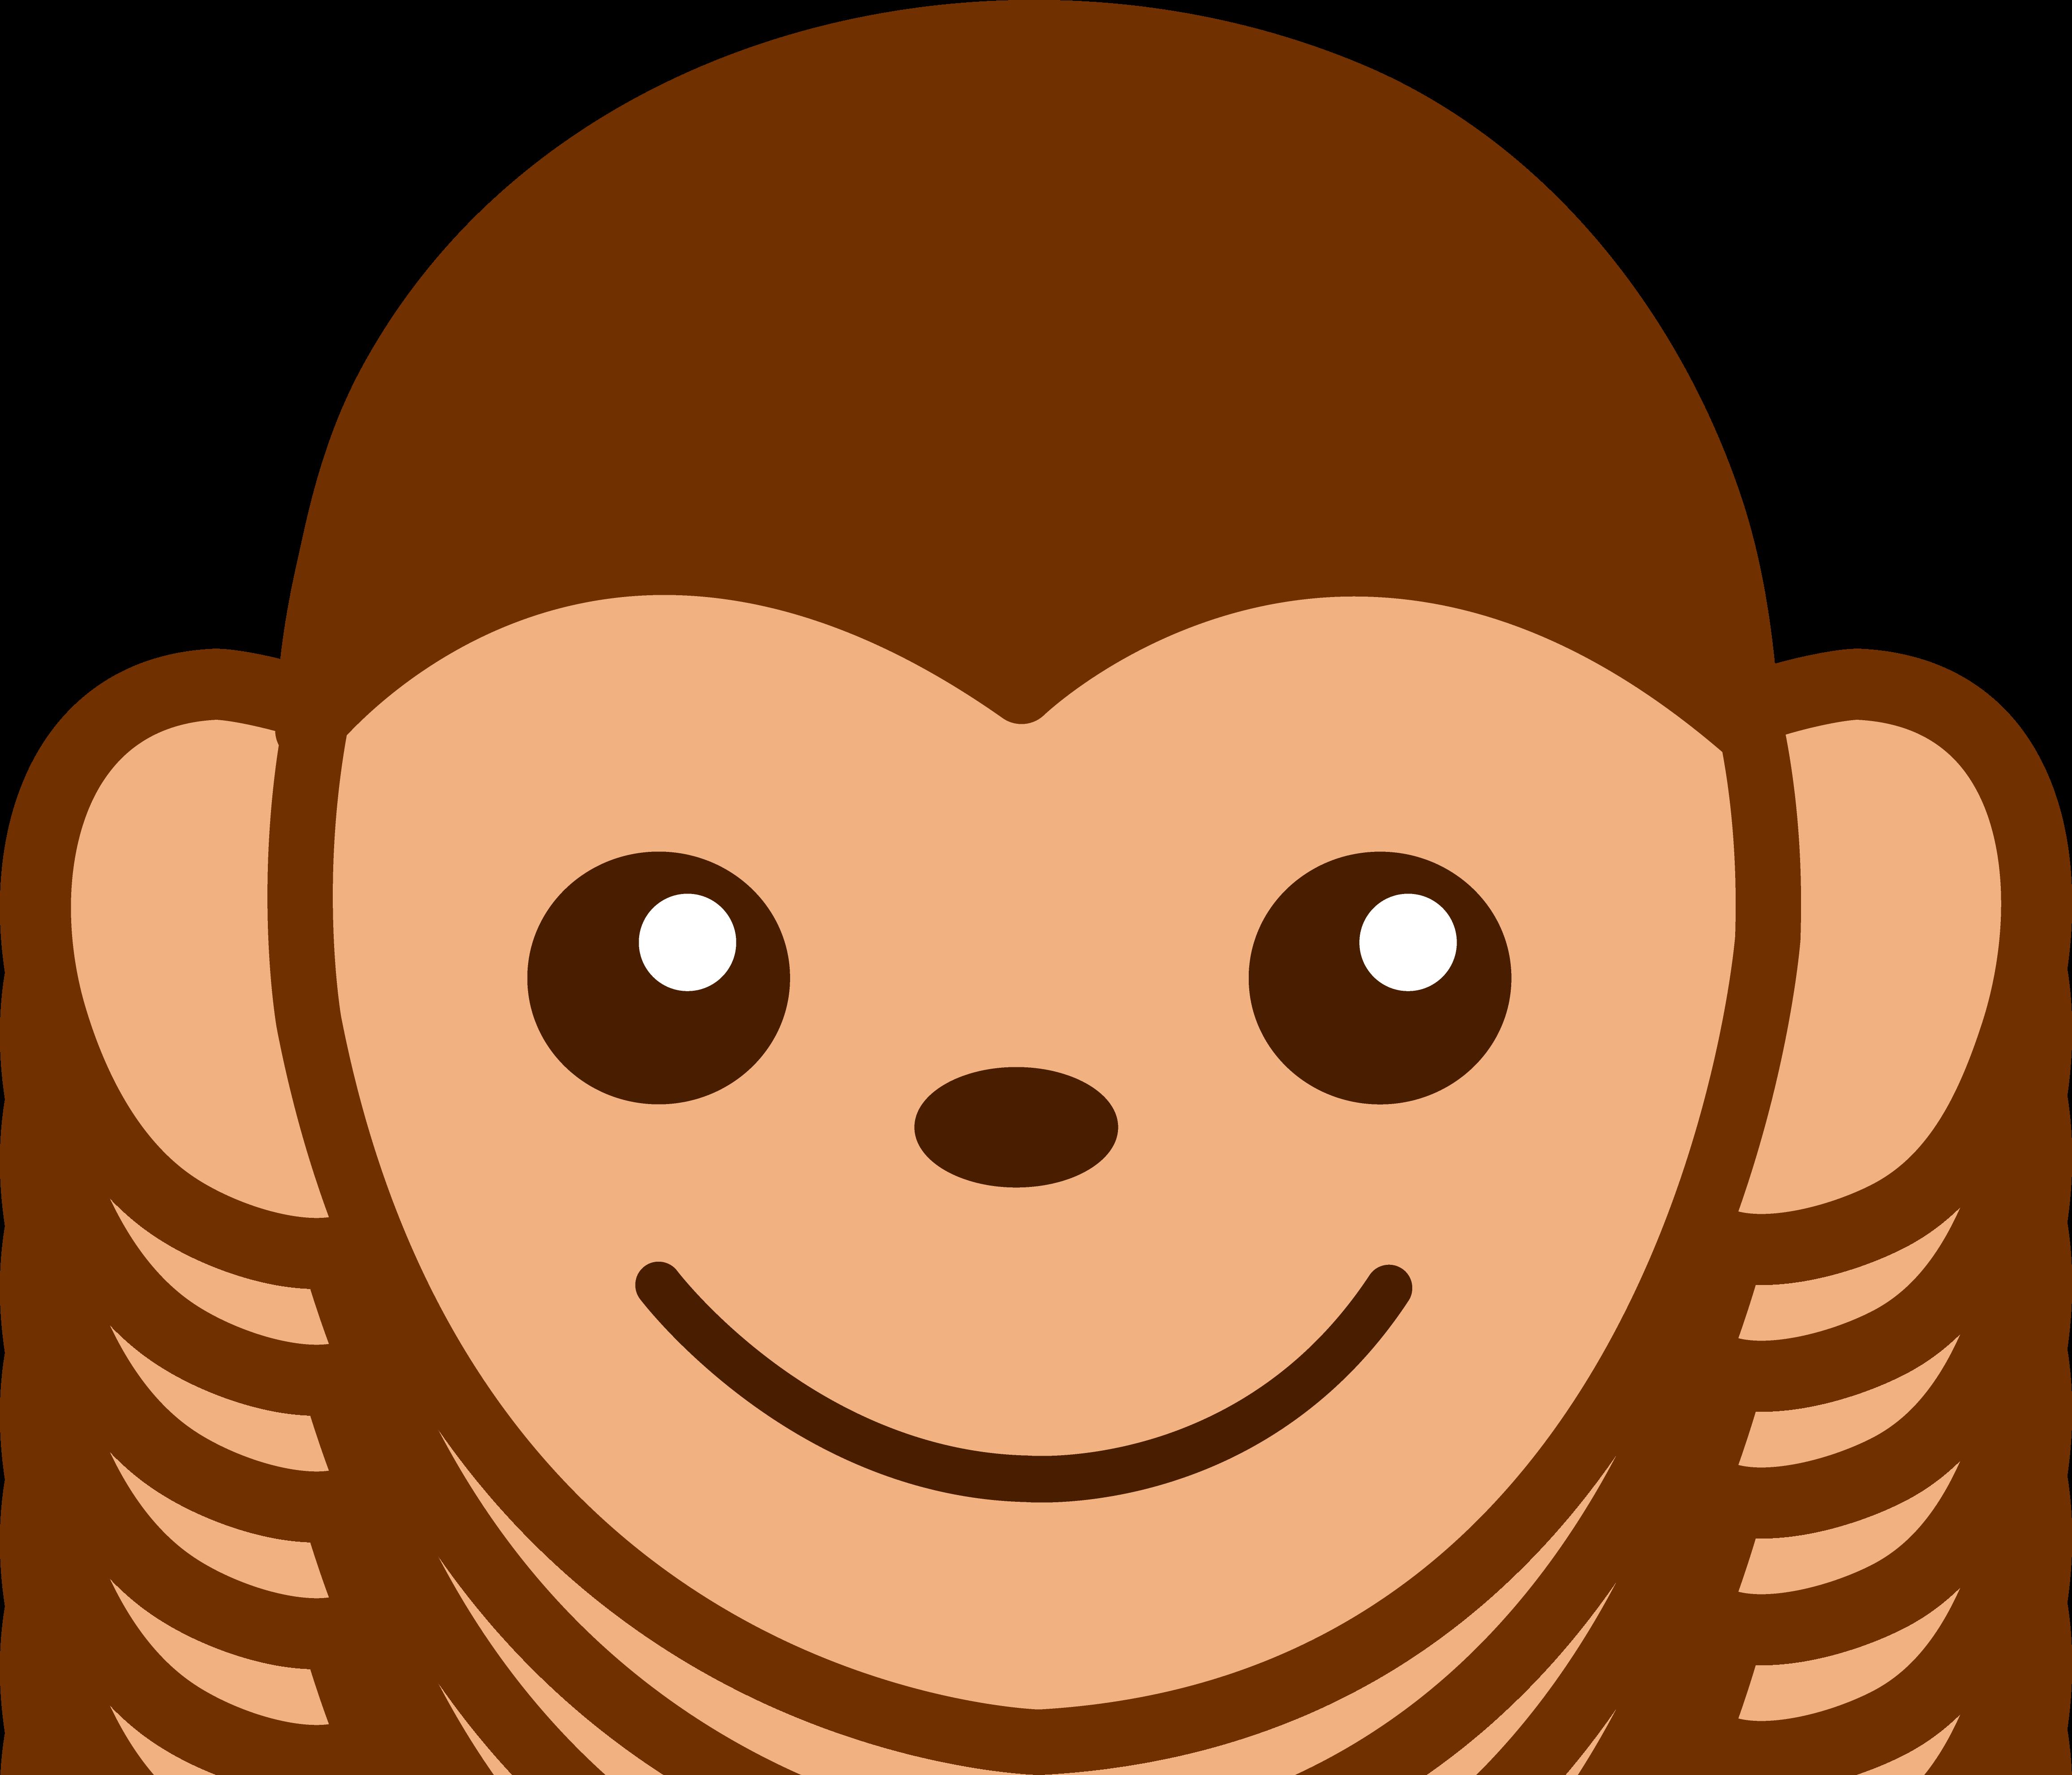 Faces clipart easy. Clip art cute monkey